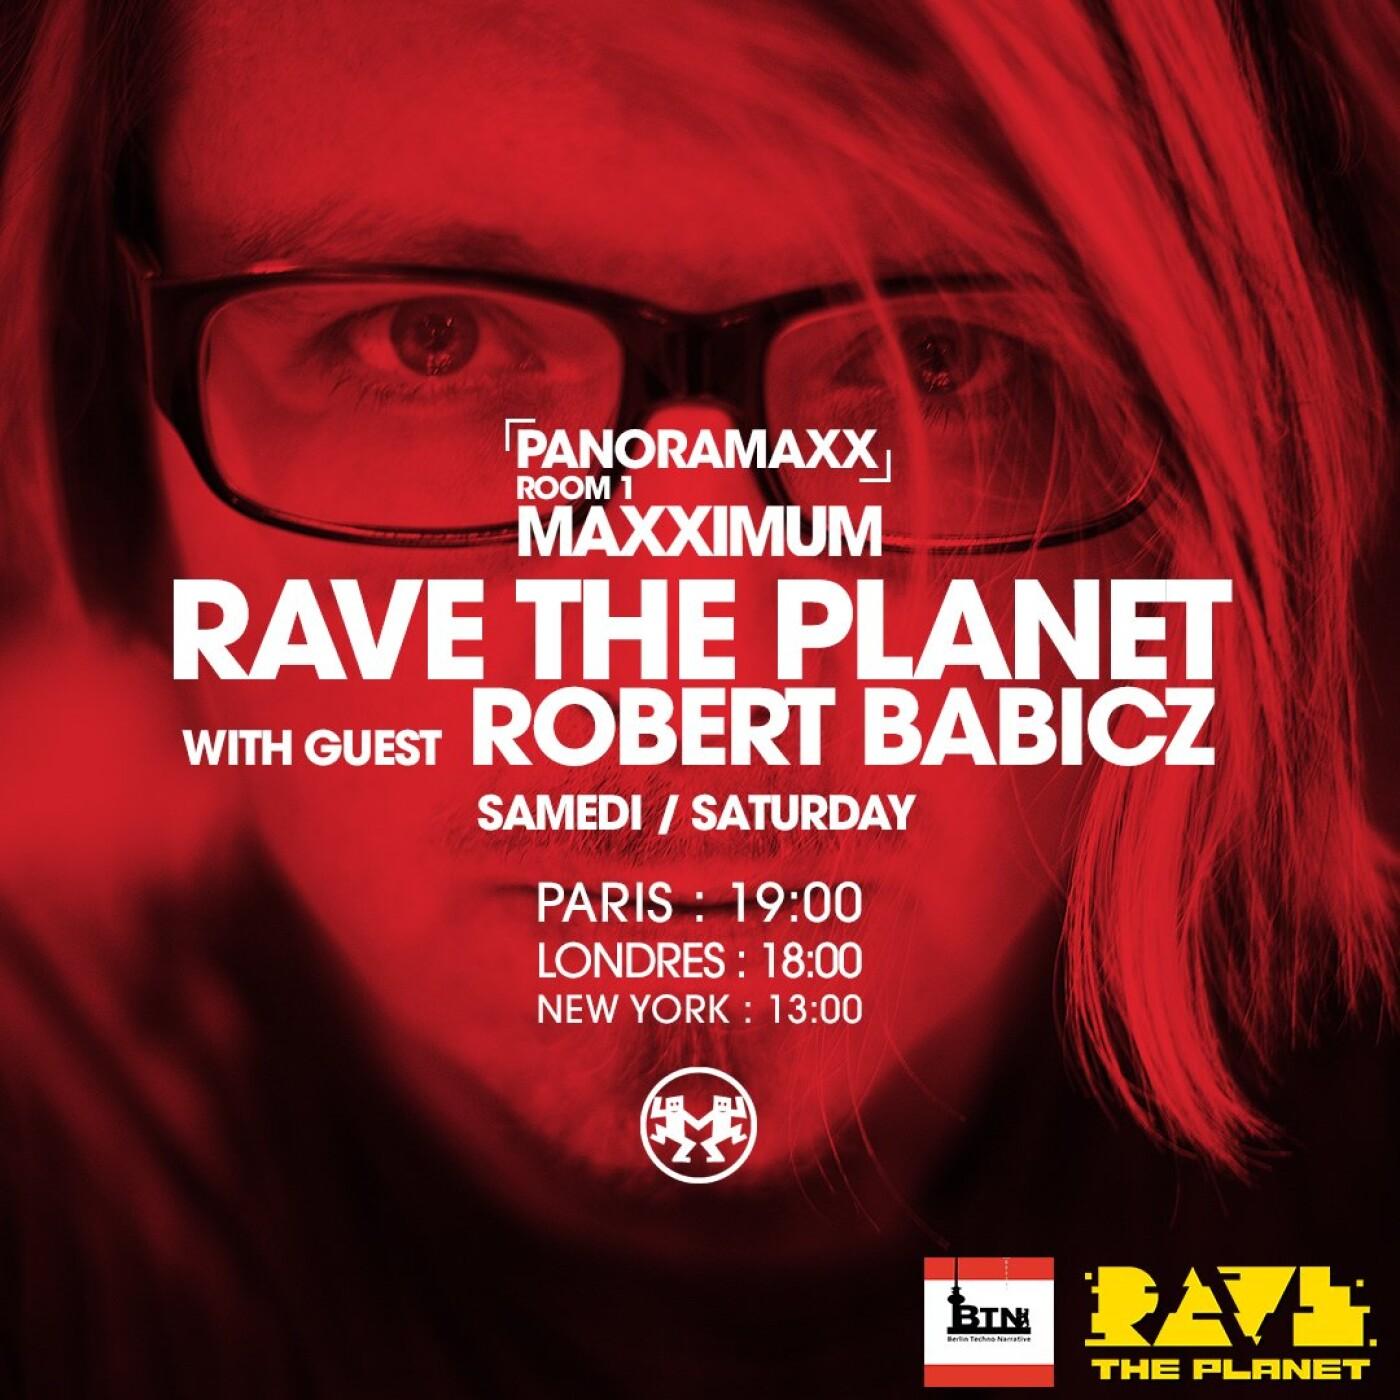 PANORAMAXX : ROBERT BABICZ